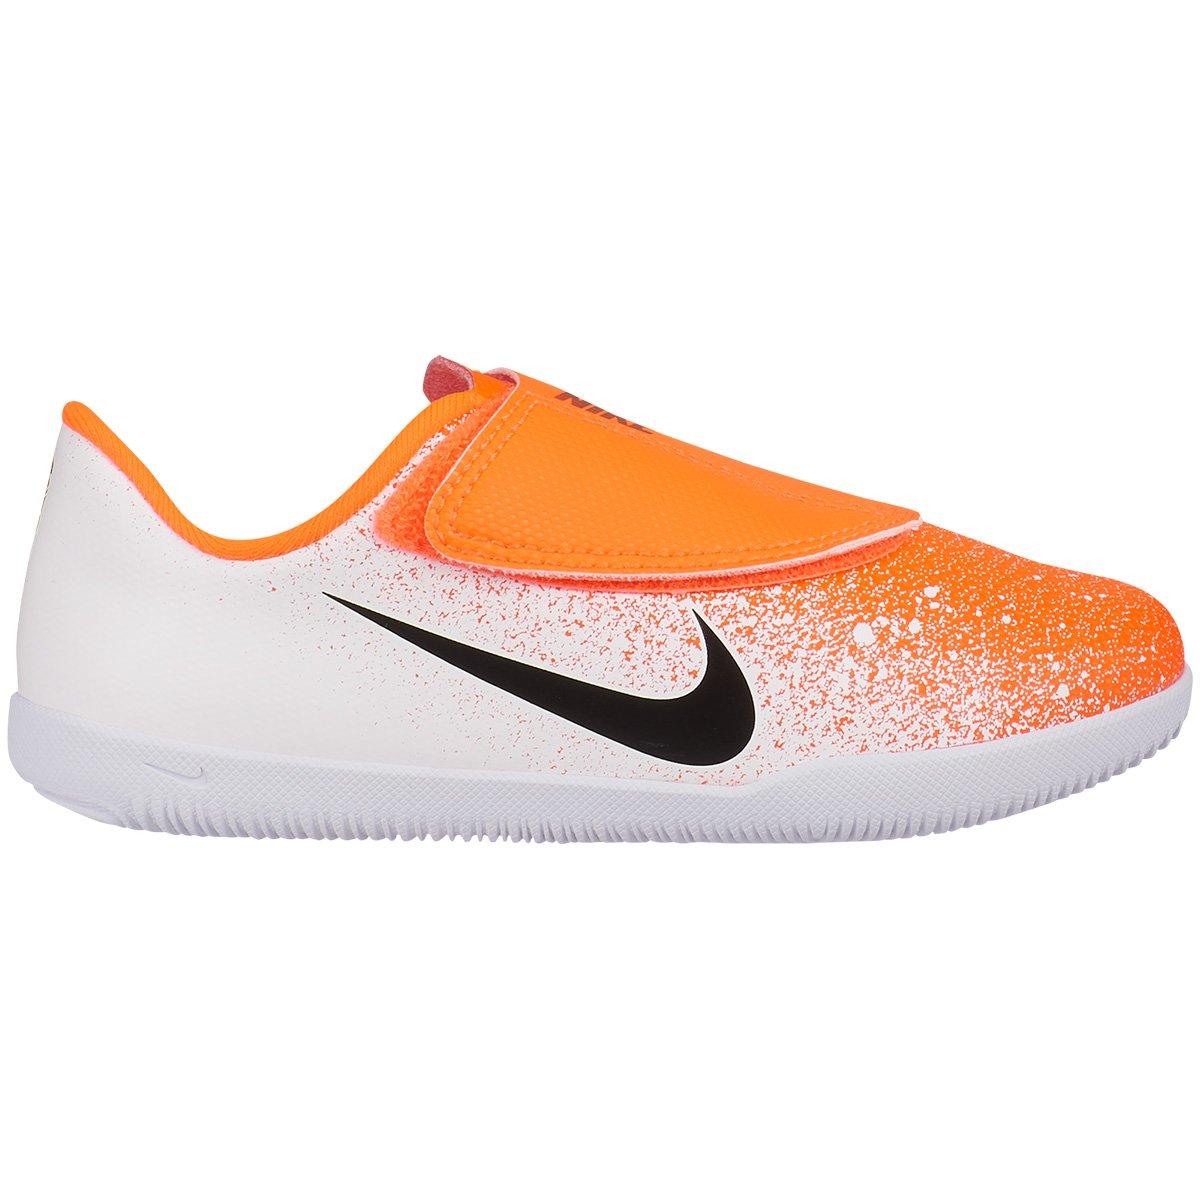 2ddf14bc70aaf Chuteira Futsal Infantil Nike Mercurial Vapor 12 Club PS IC